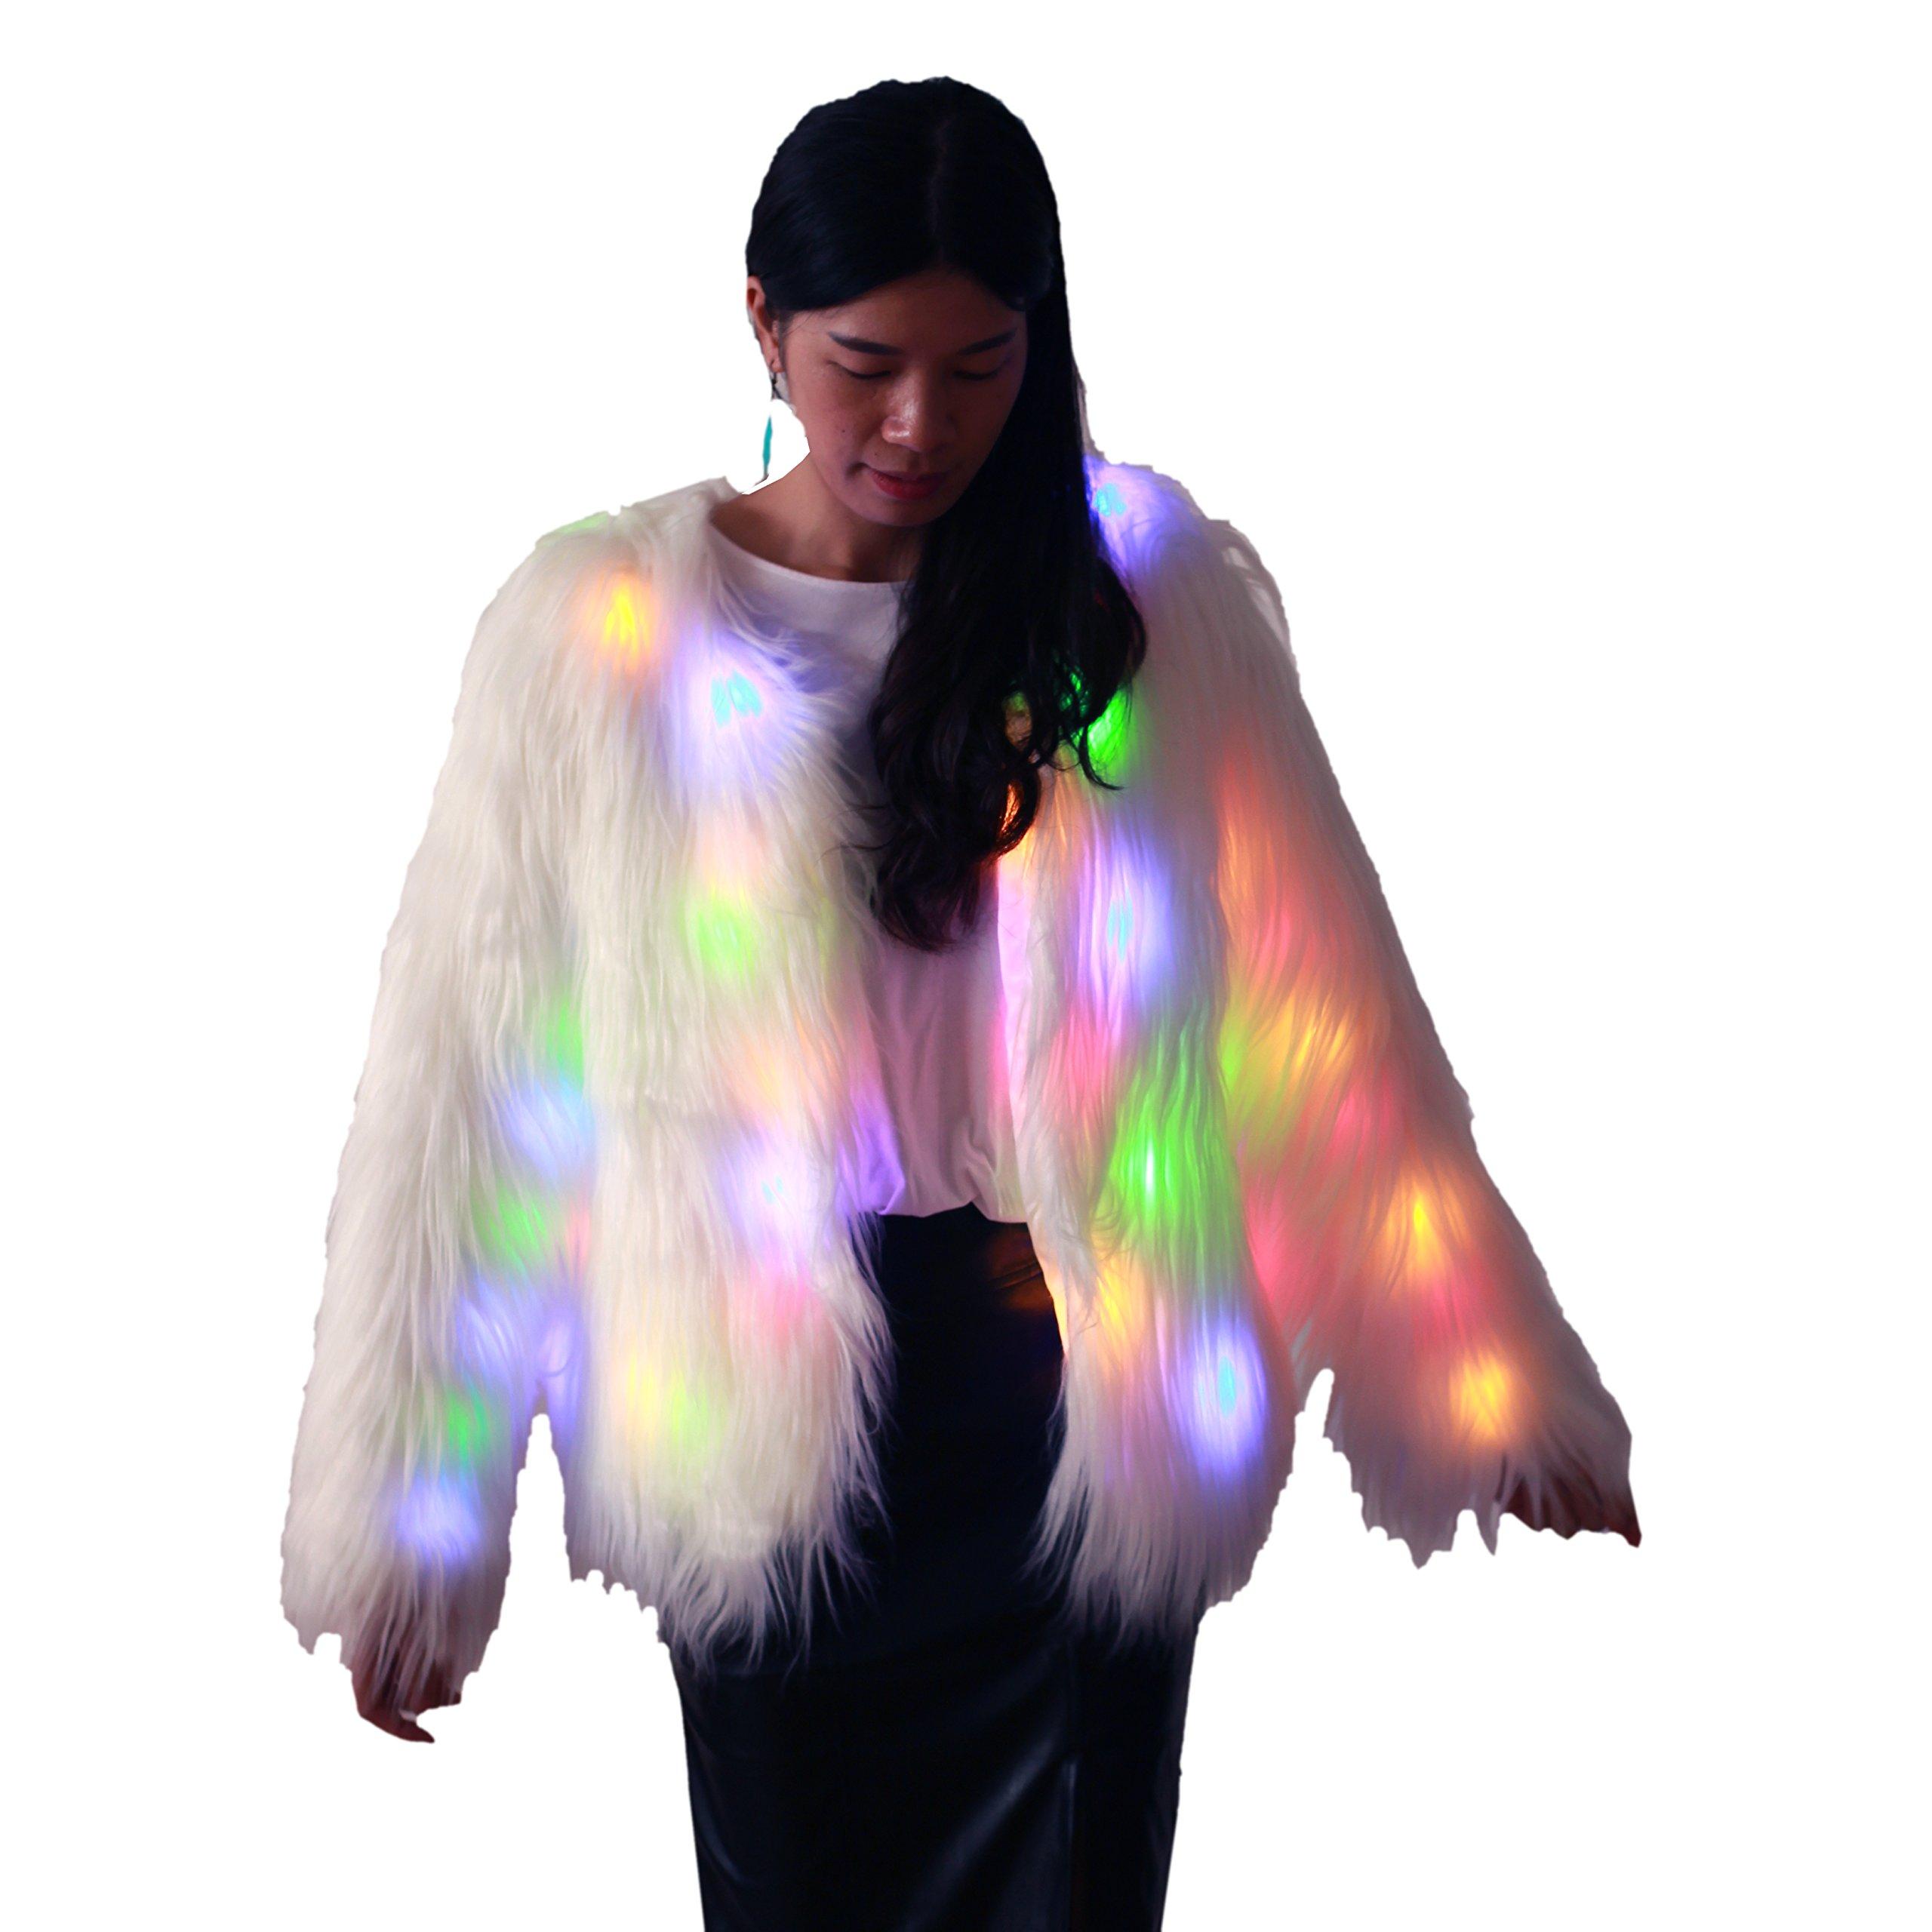 Ohlees Led Light up Shining Christmas Party Women Winter Long Fur Vest Coat Decorative Perform Dance (M, Coat-1)